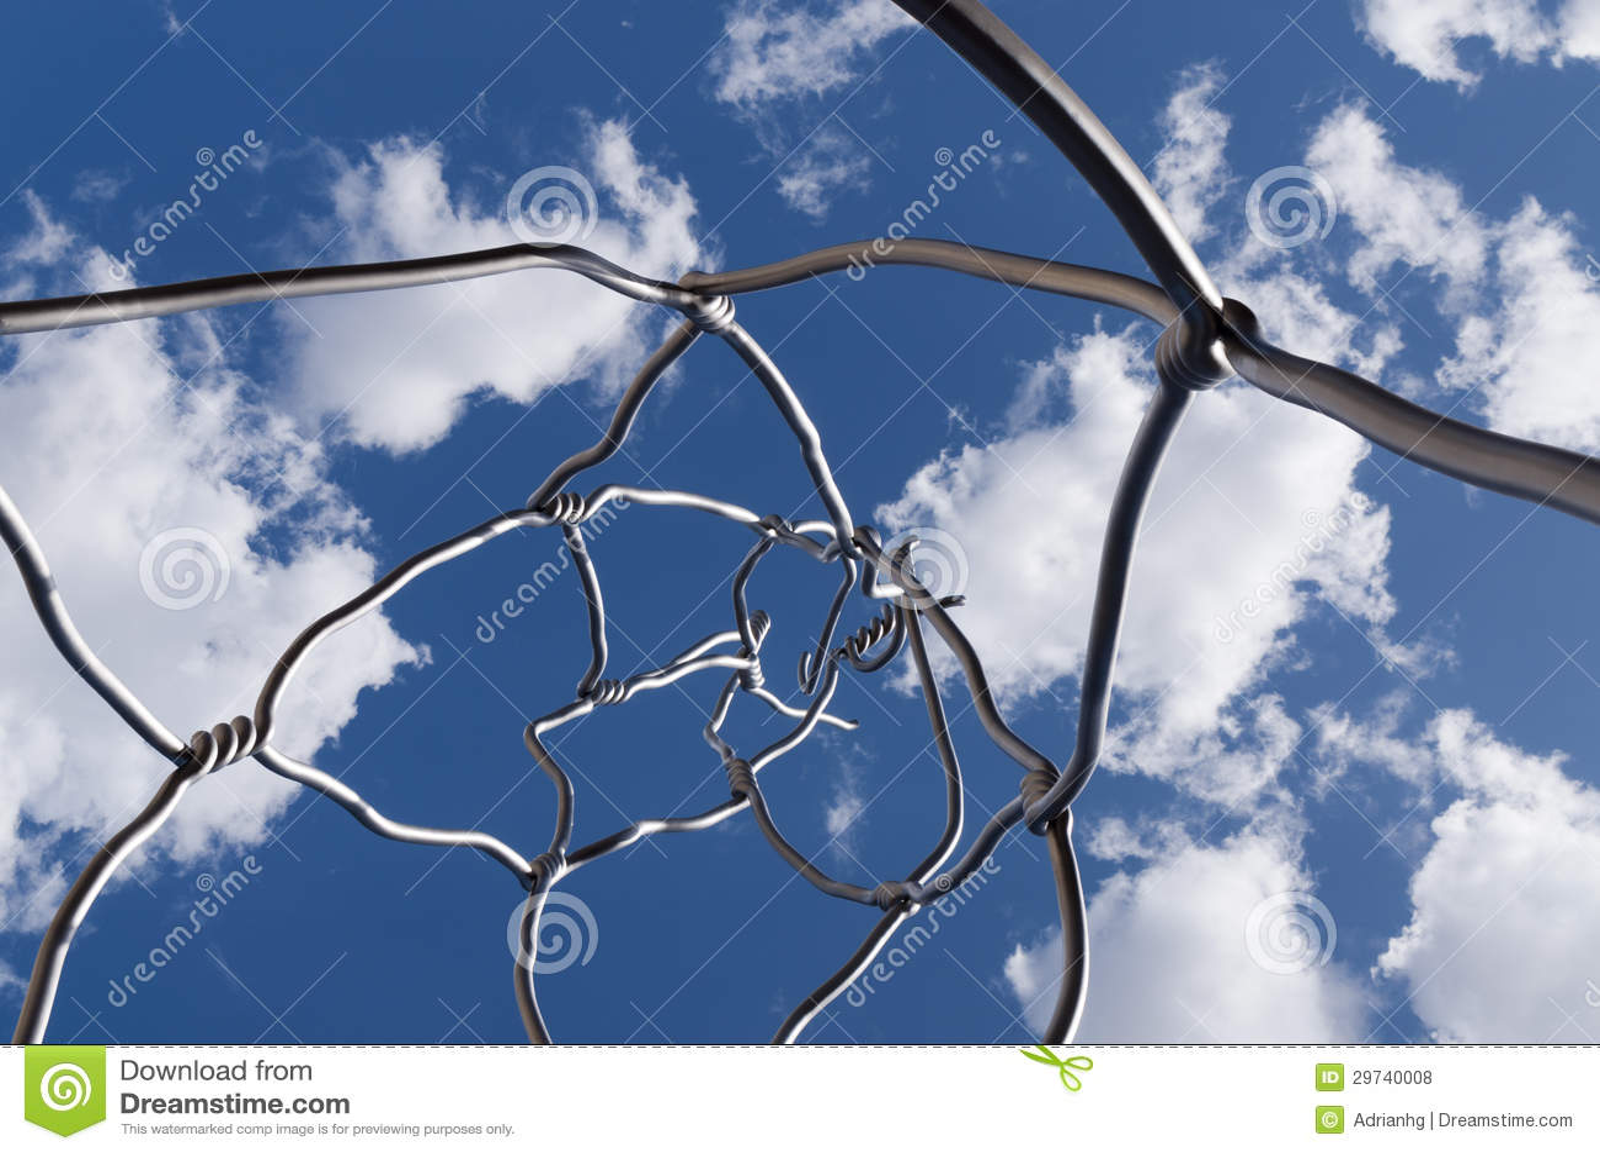 Ziemlich 2d Drahtskulptur Bilder - Elektrische Schaltplan-Ideen ...